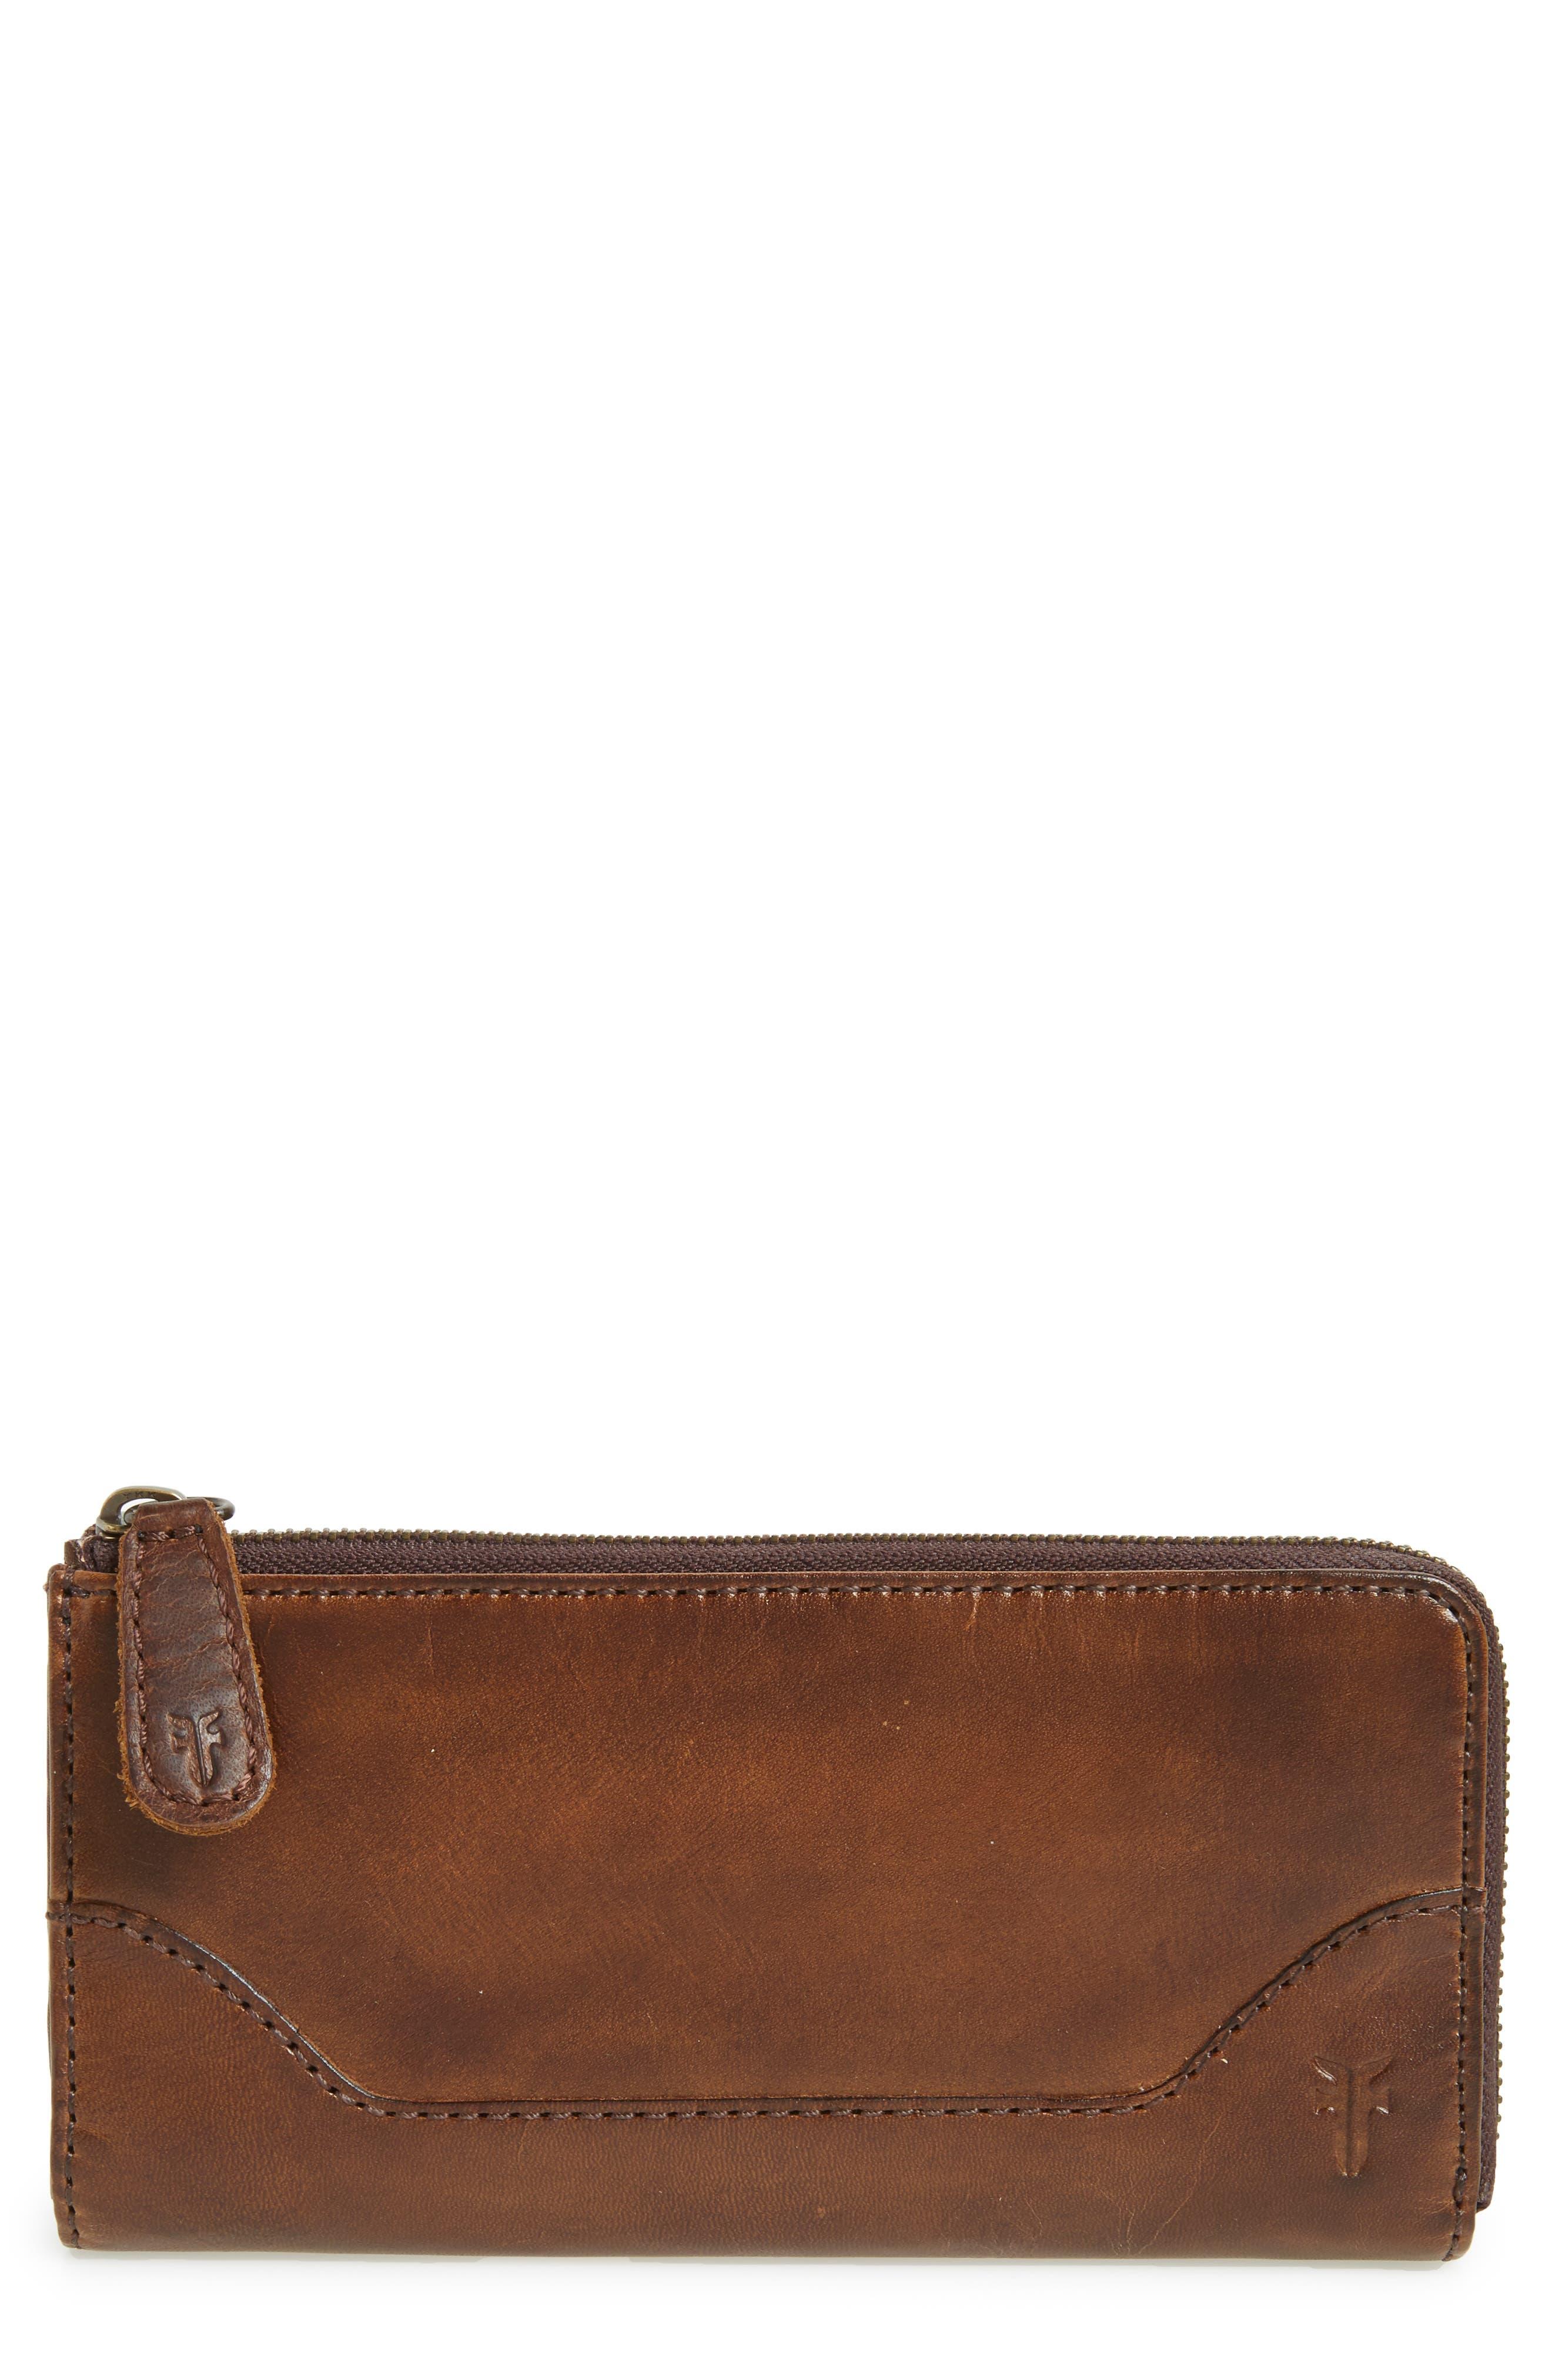 Melissa Leather Wallet,                         Main,                         color, Dark Brown